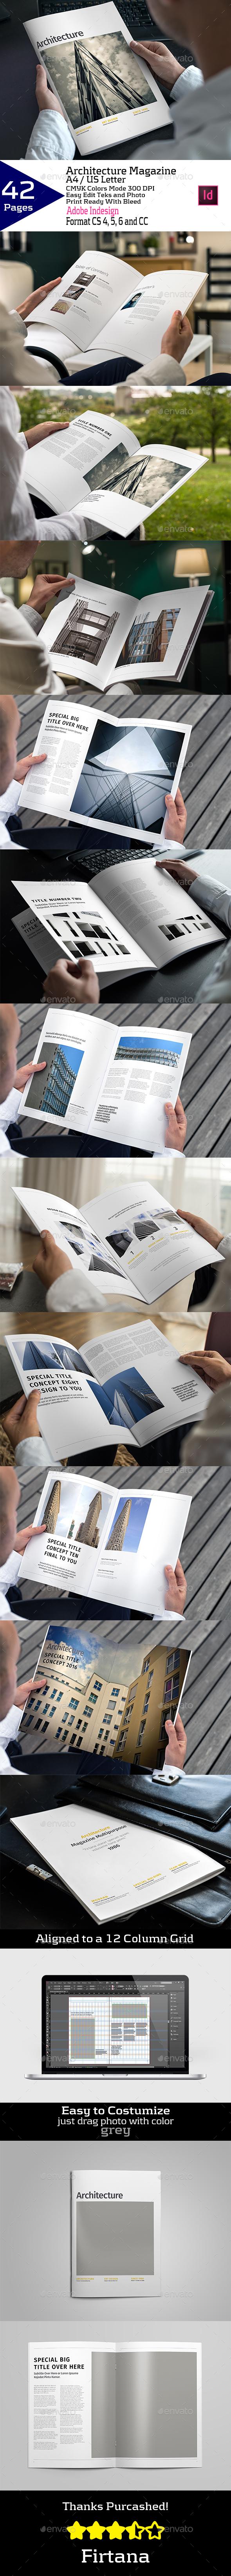 Architecture Magazine A4/US Letter - Magazines Print Templates